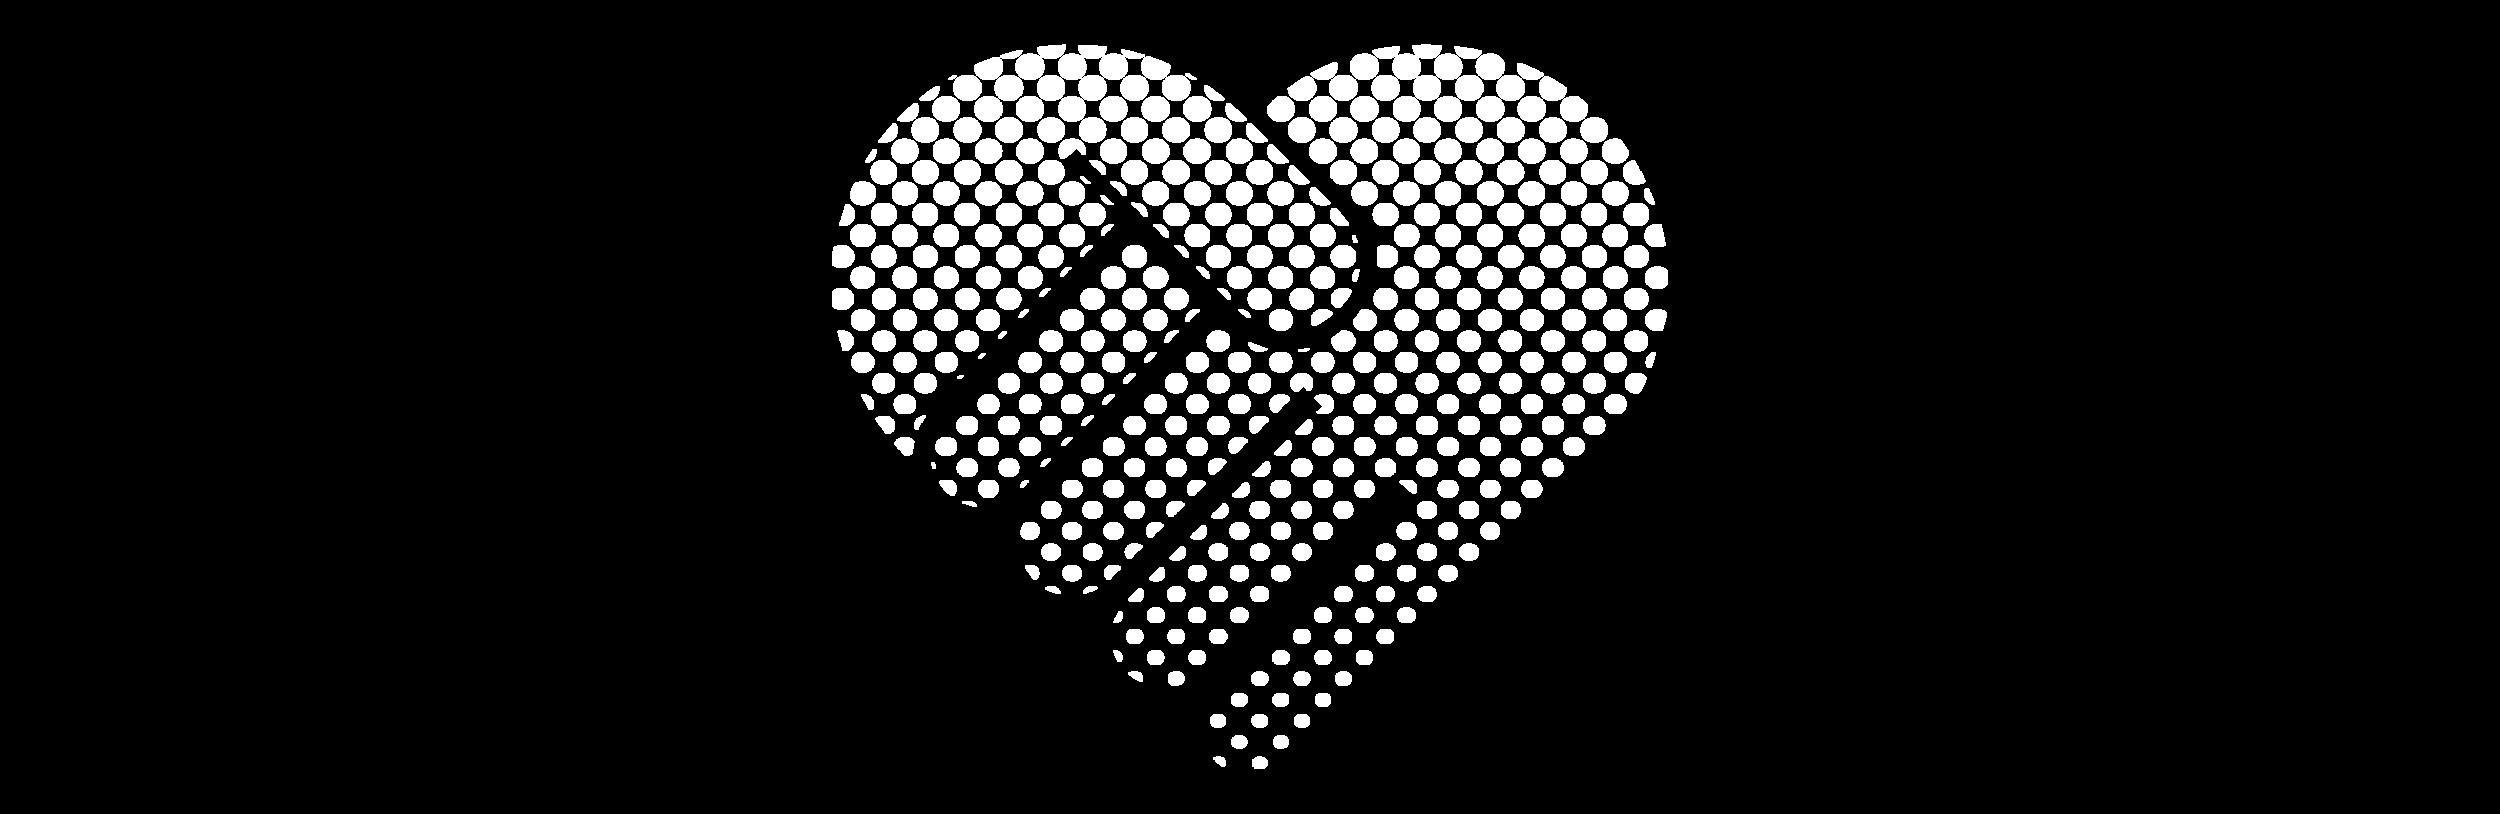 MelNZ-WebsiteIcon-Support-smallwide.png